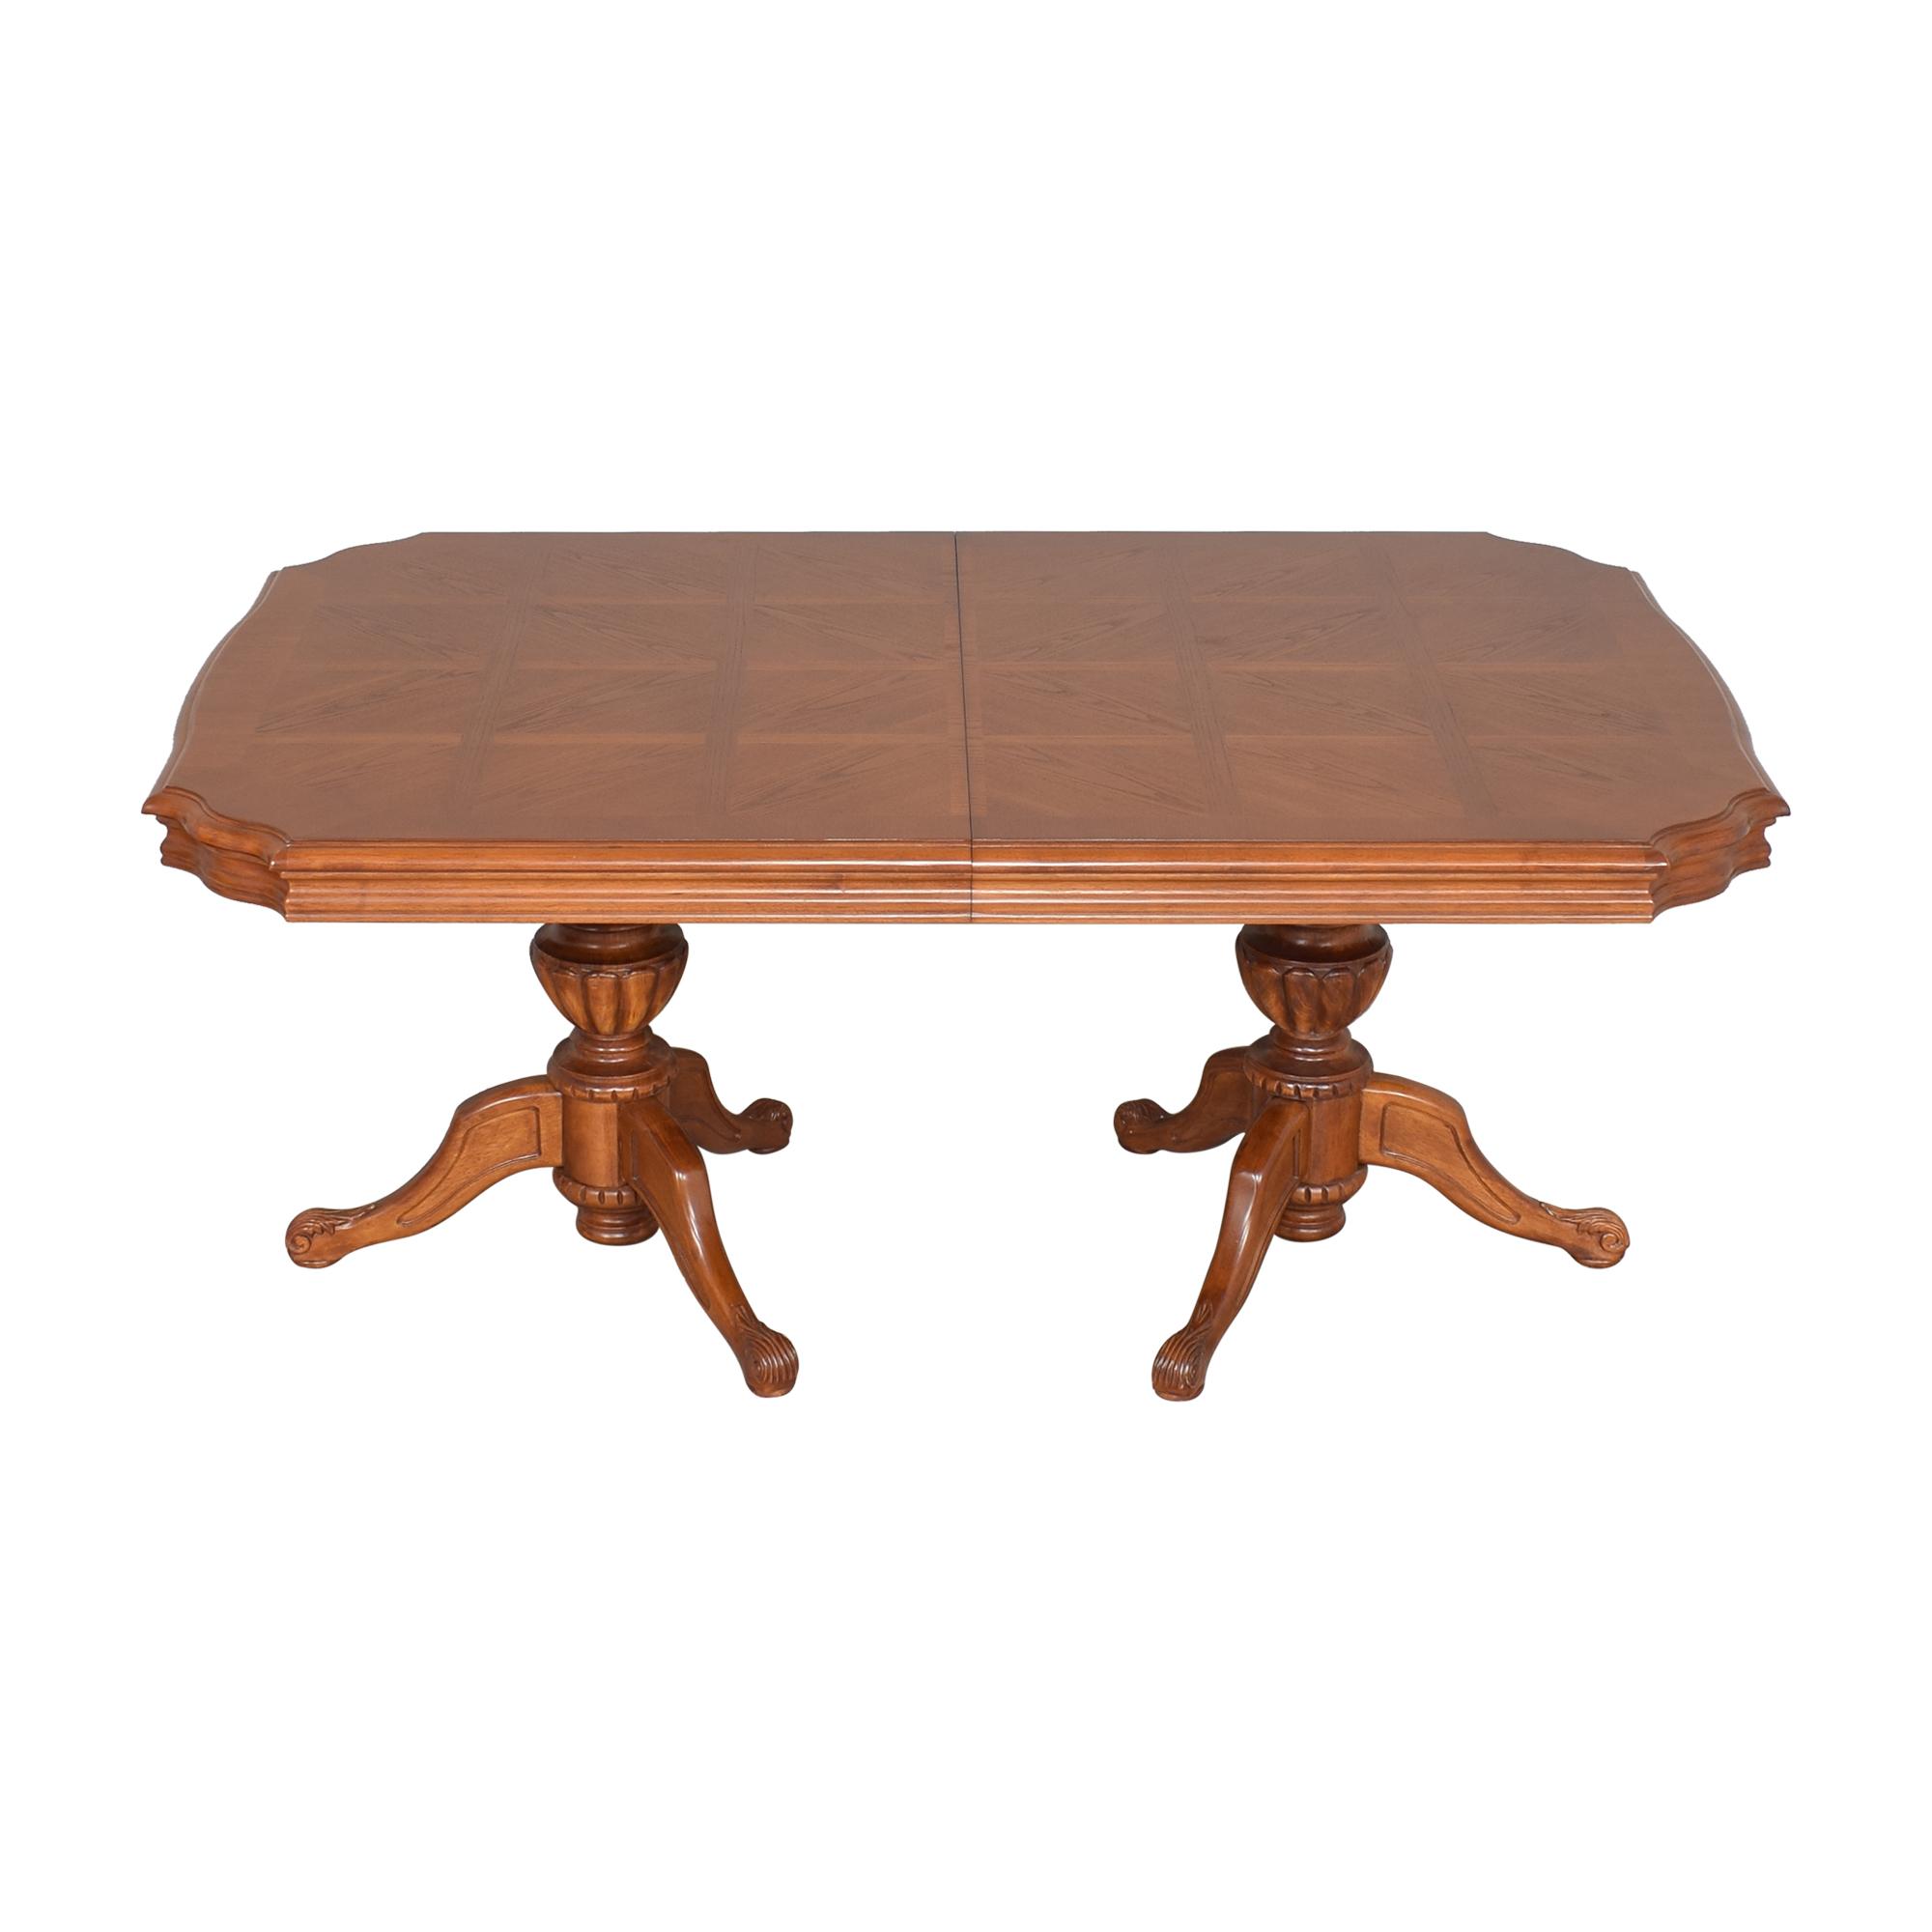 North Carolina Furniture Company North Carolina Furniture Extendable Dining Table for sale